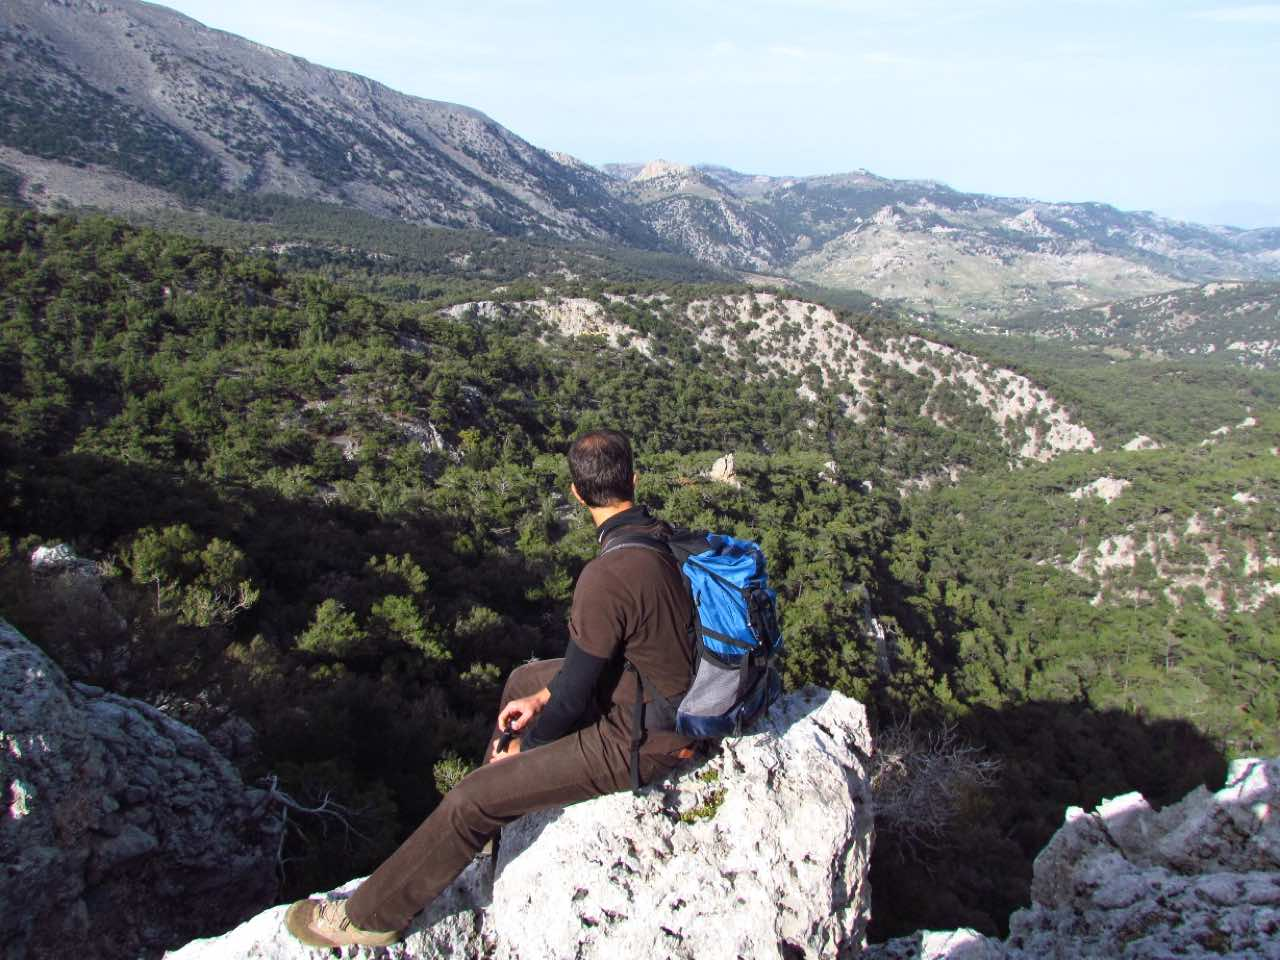 Neraidogoula The Legendary Cave In Lassithi Mountain Range, caving east crete, caving activity crete, crete activities, neraidogoula cave crete, things to do crete, best activities crete